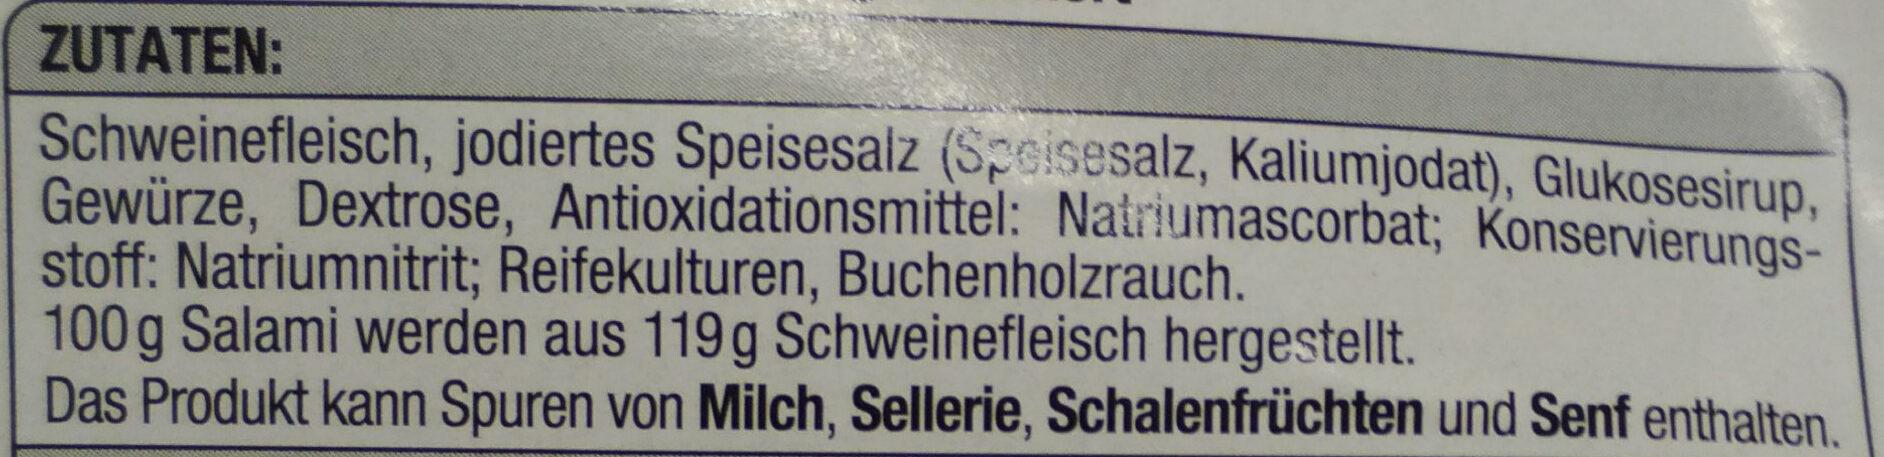 Hauchfeine Delikatess Salami geräuchtert - Ingrediënten - de